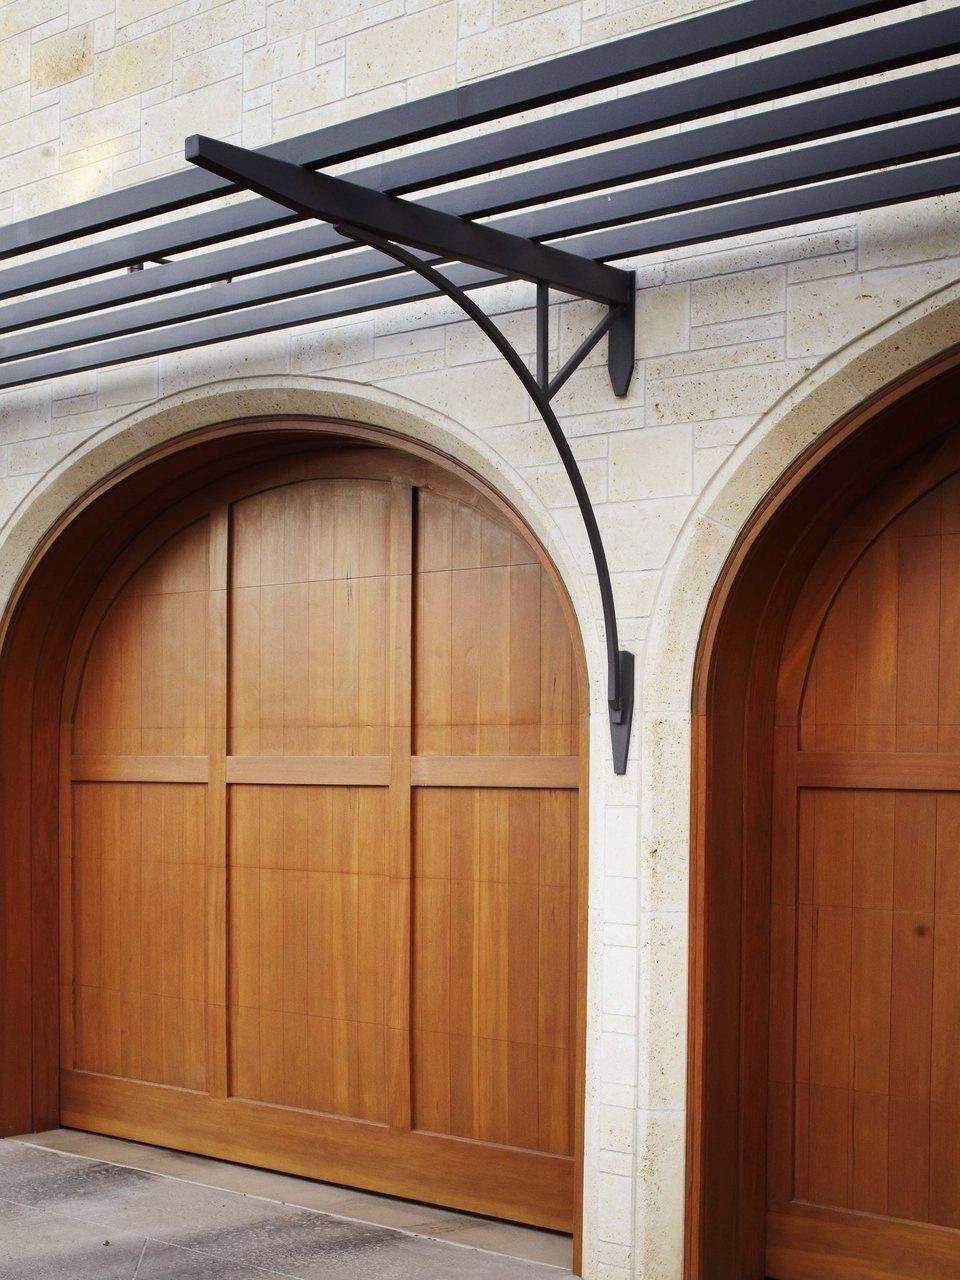 Pergola over garage door | Garage pergola